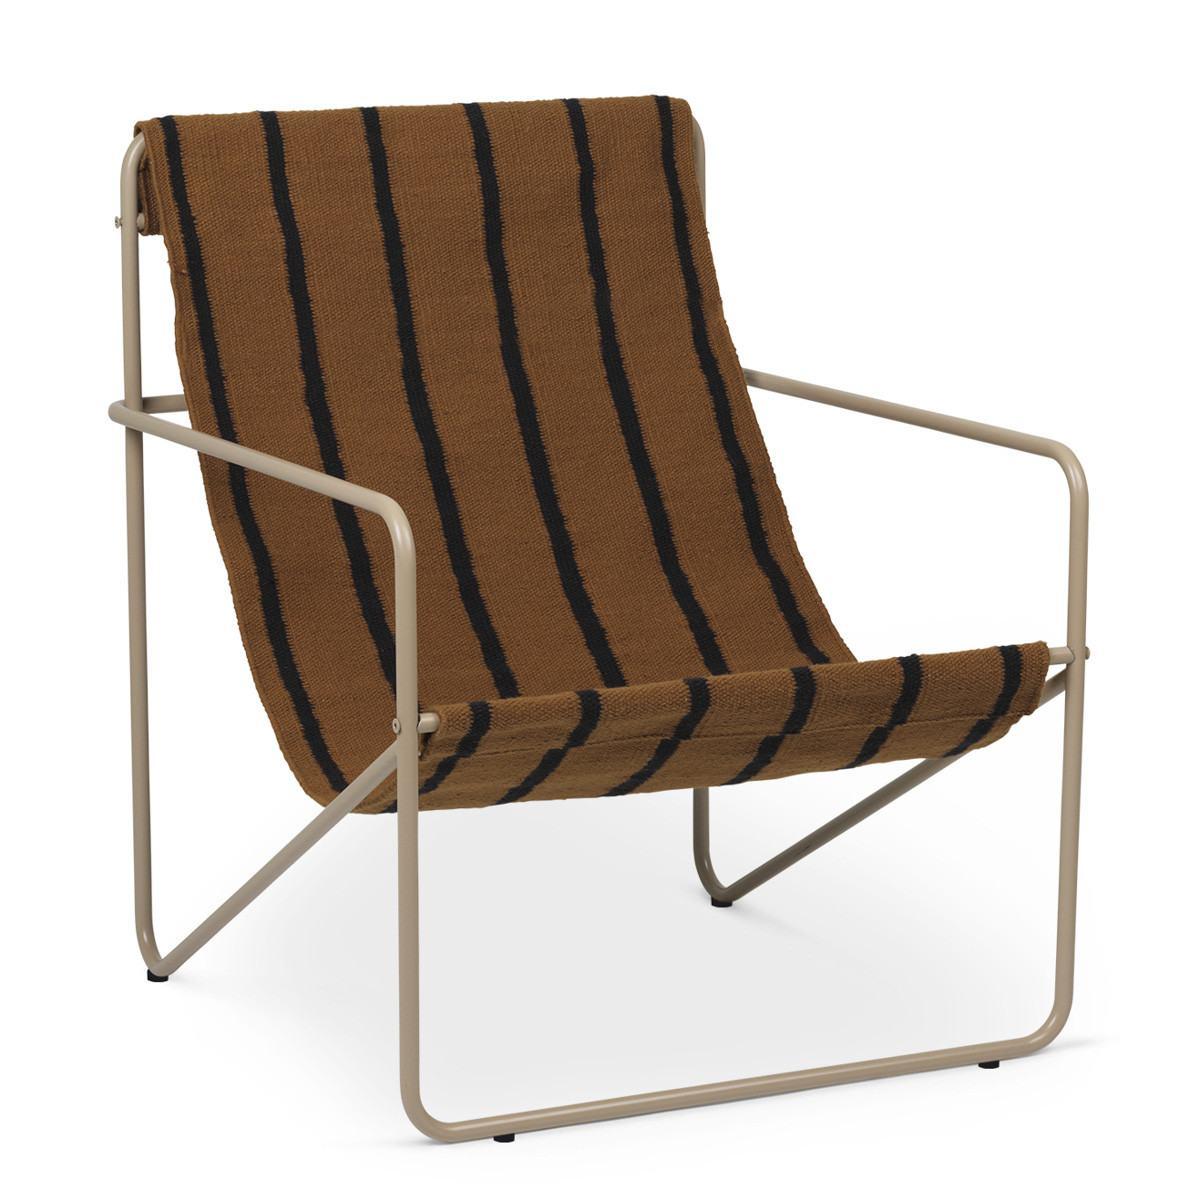 Ferm Living Desert Lounge Chair - Stripes-Cashmere